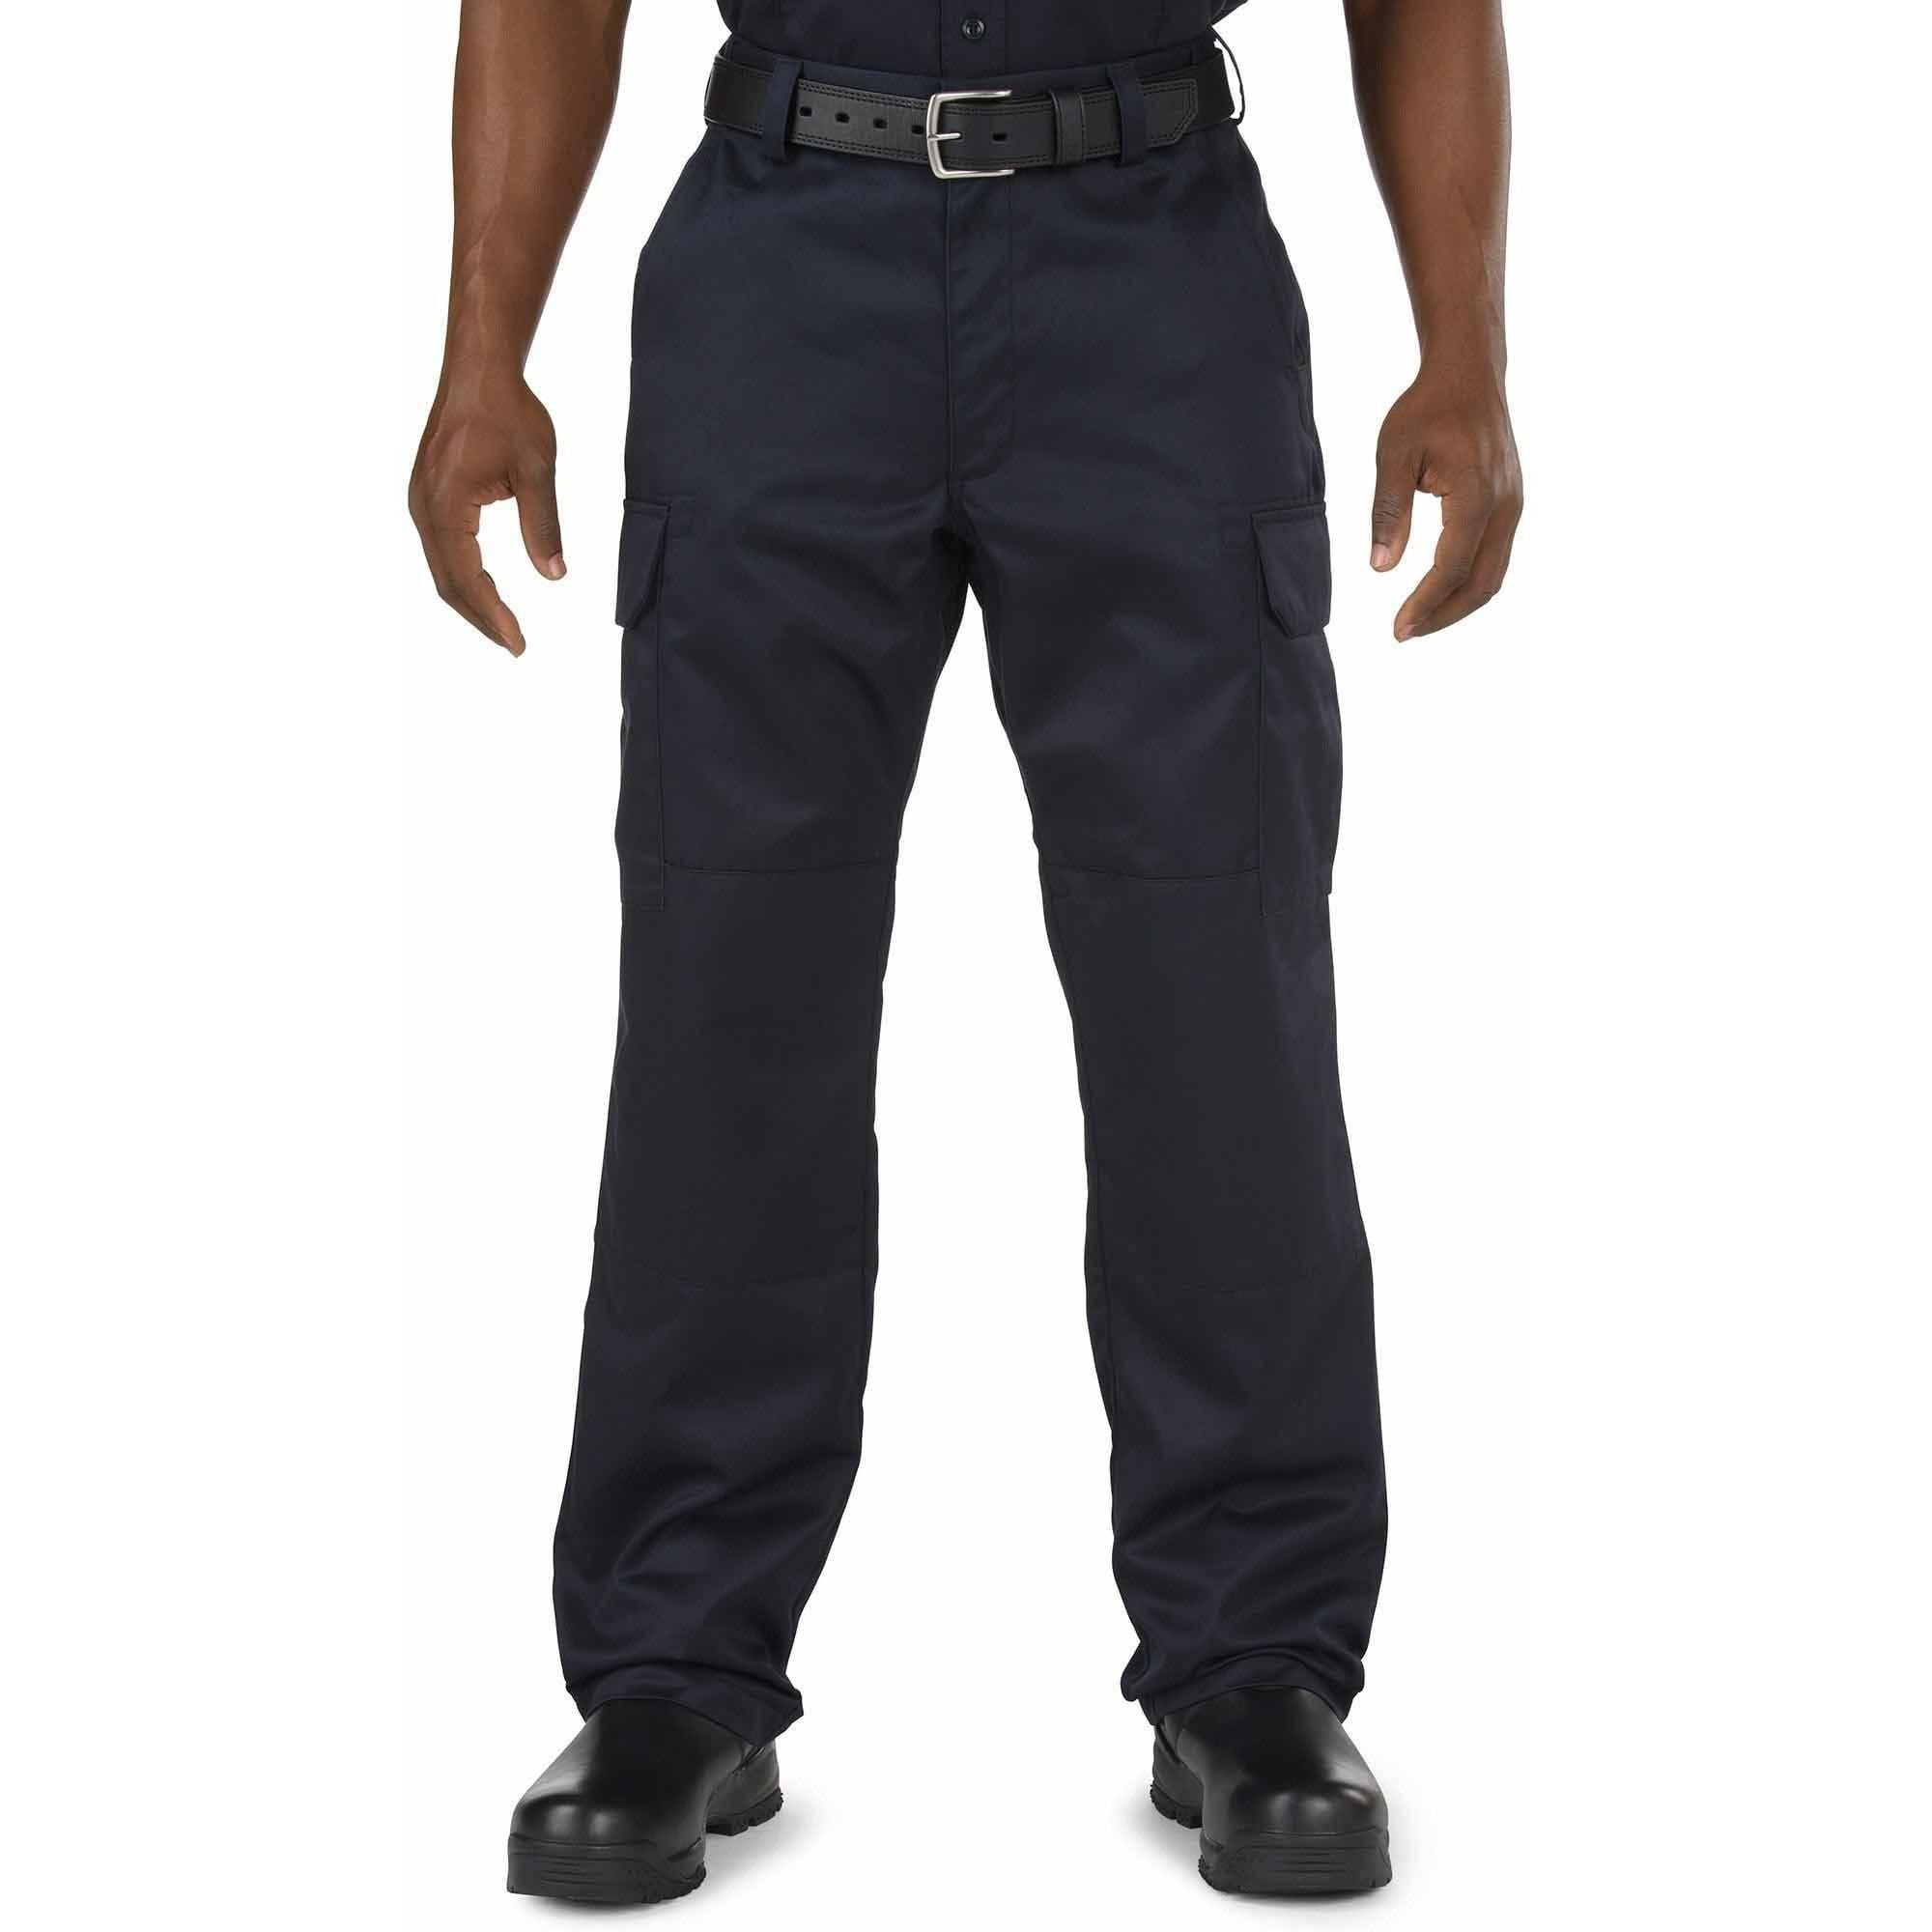 Men's Company Cargo Pant, Oversize/Unhemmed, Fire Navy